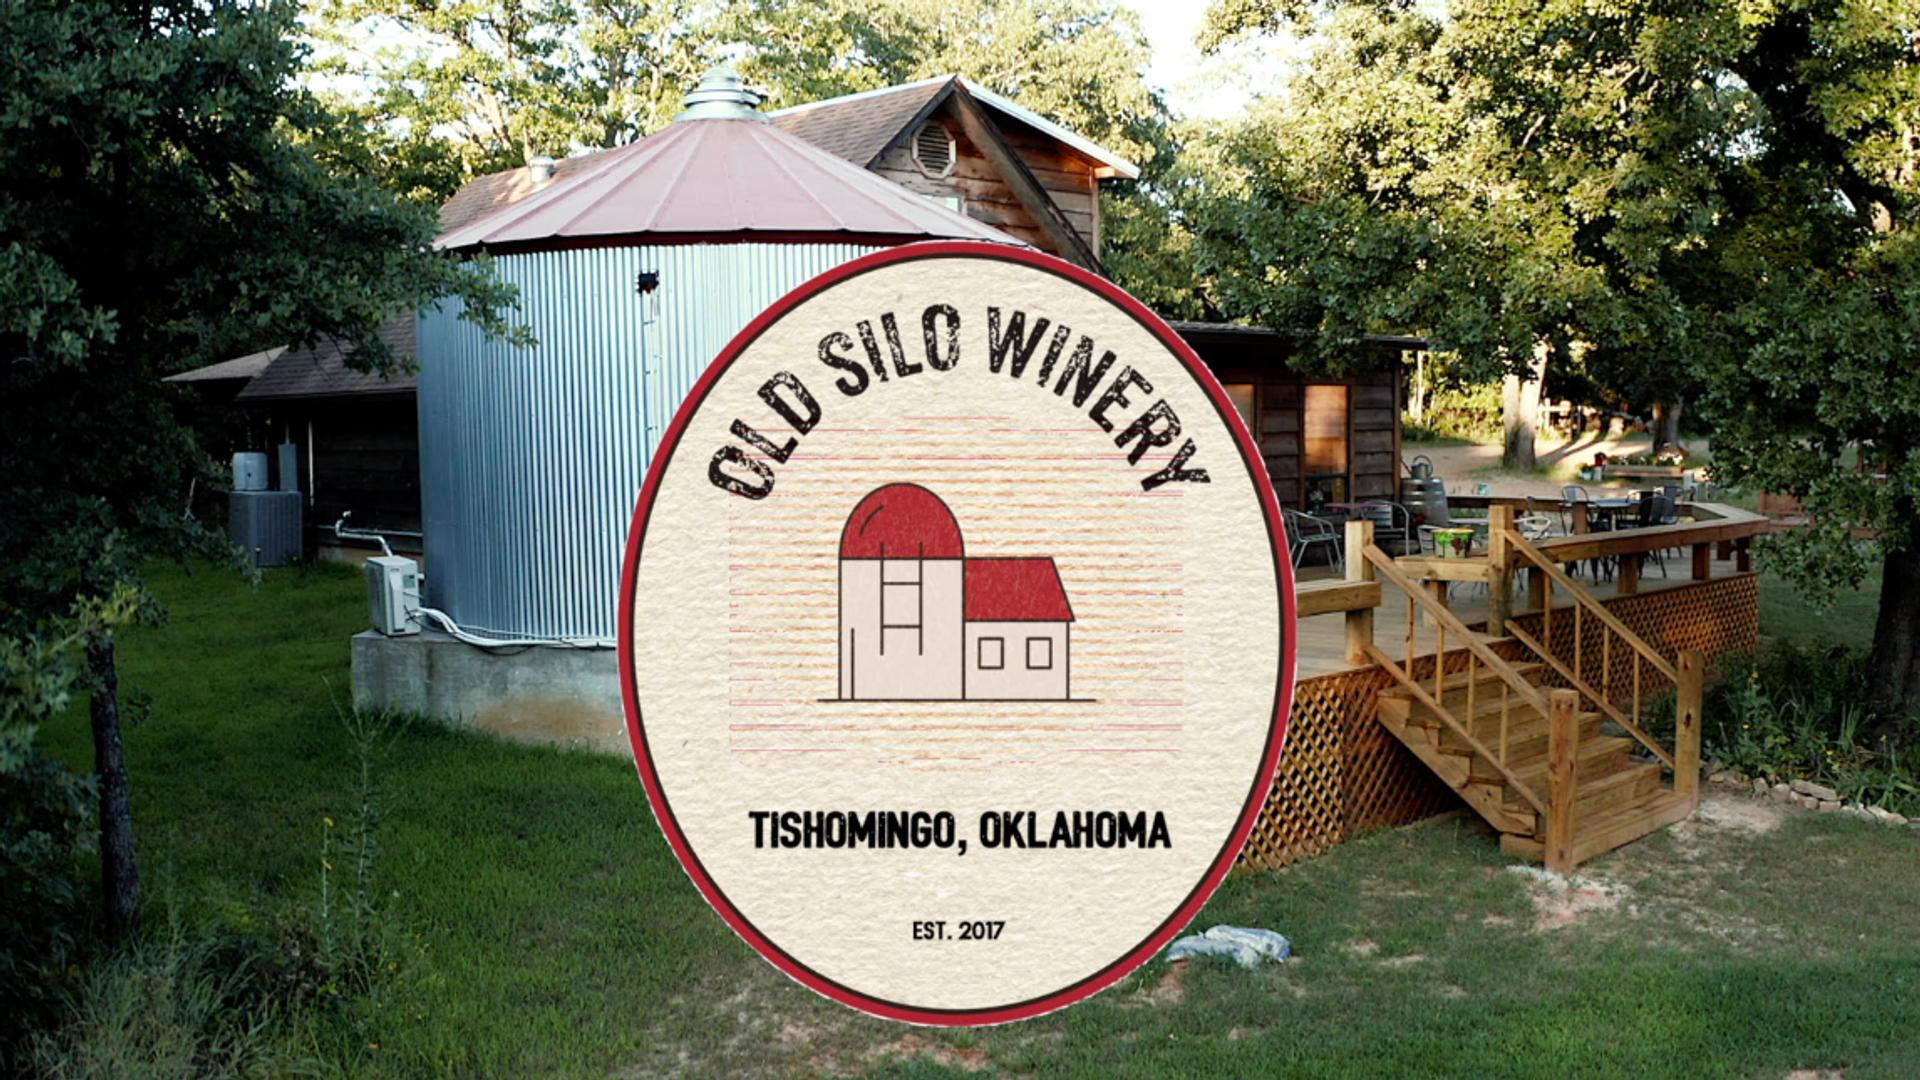 Homebird Studios: The Old Silo Winery